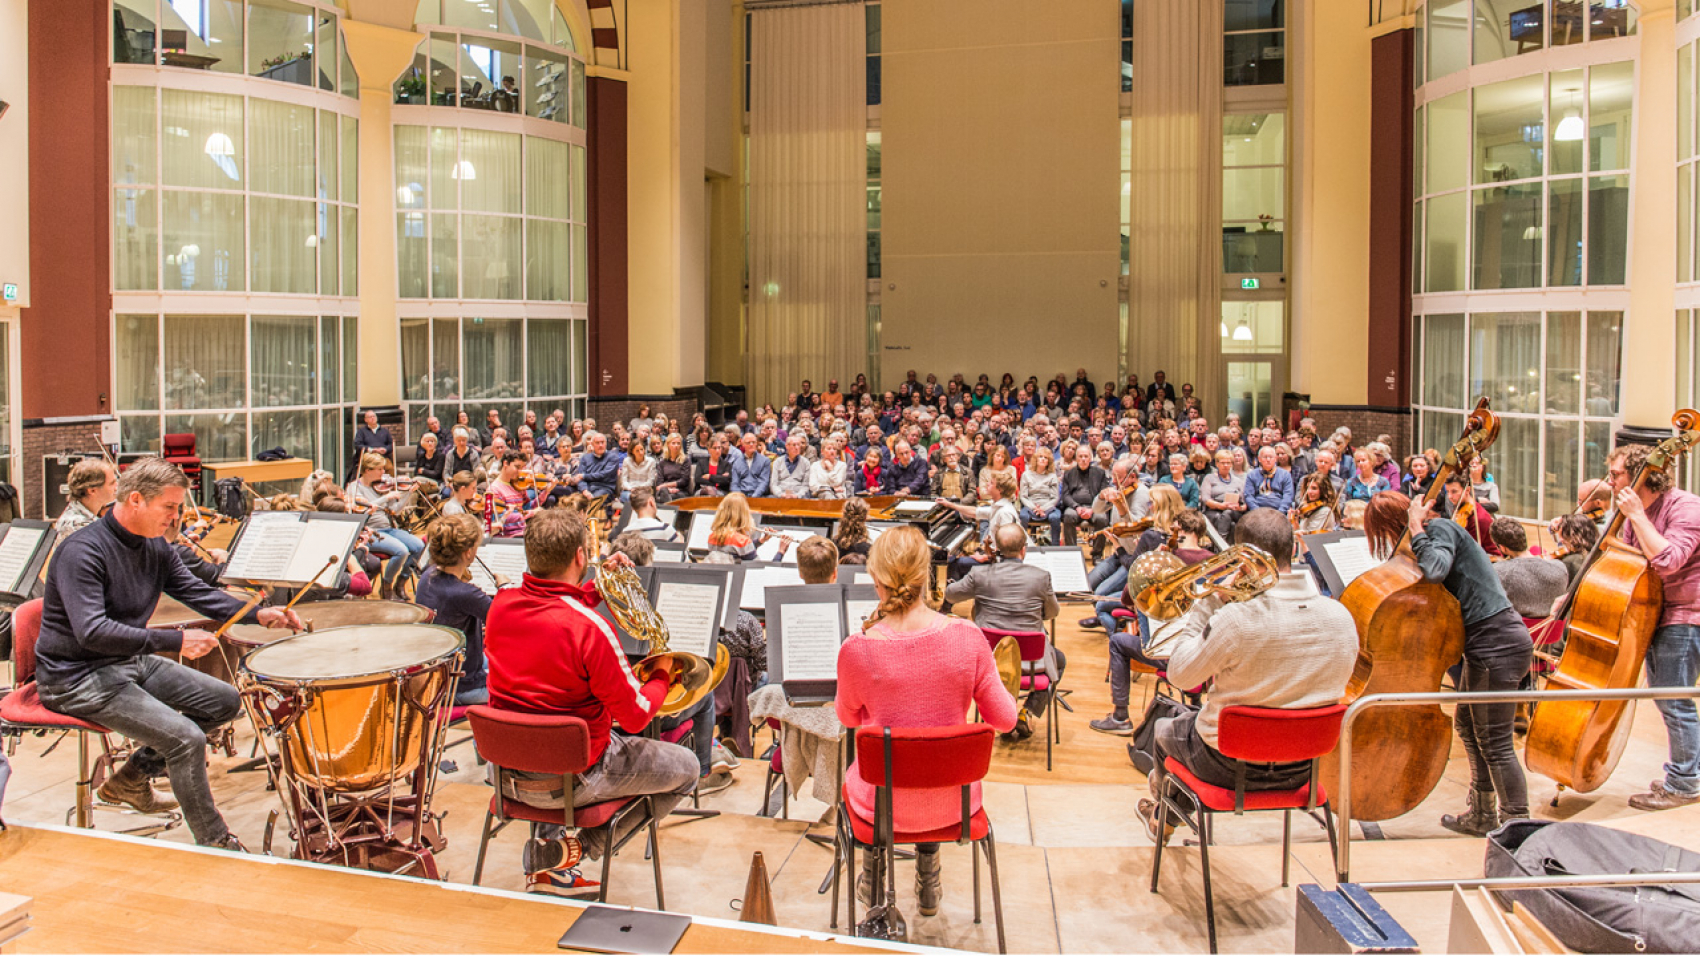 Openbare repetitie Clyne, Walton, Elgar